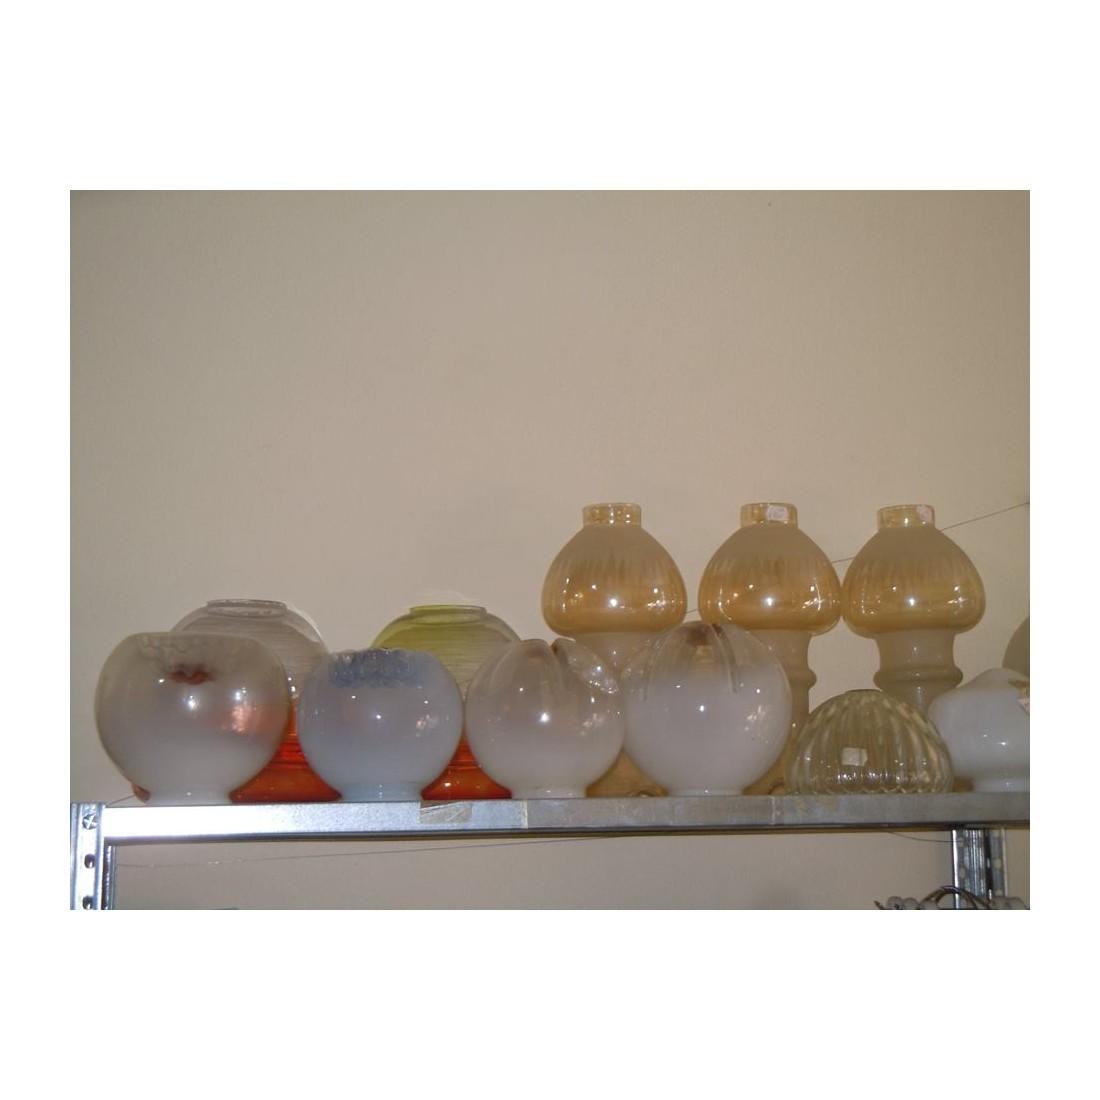 Foglia vetro ricambio bov0042 · foglia vetro ricambio per lampadario bianco latte. Ricambio Lampadari Paralumi Boccia In Vetro Grande Assortimento